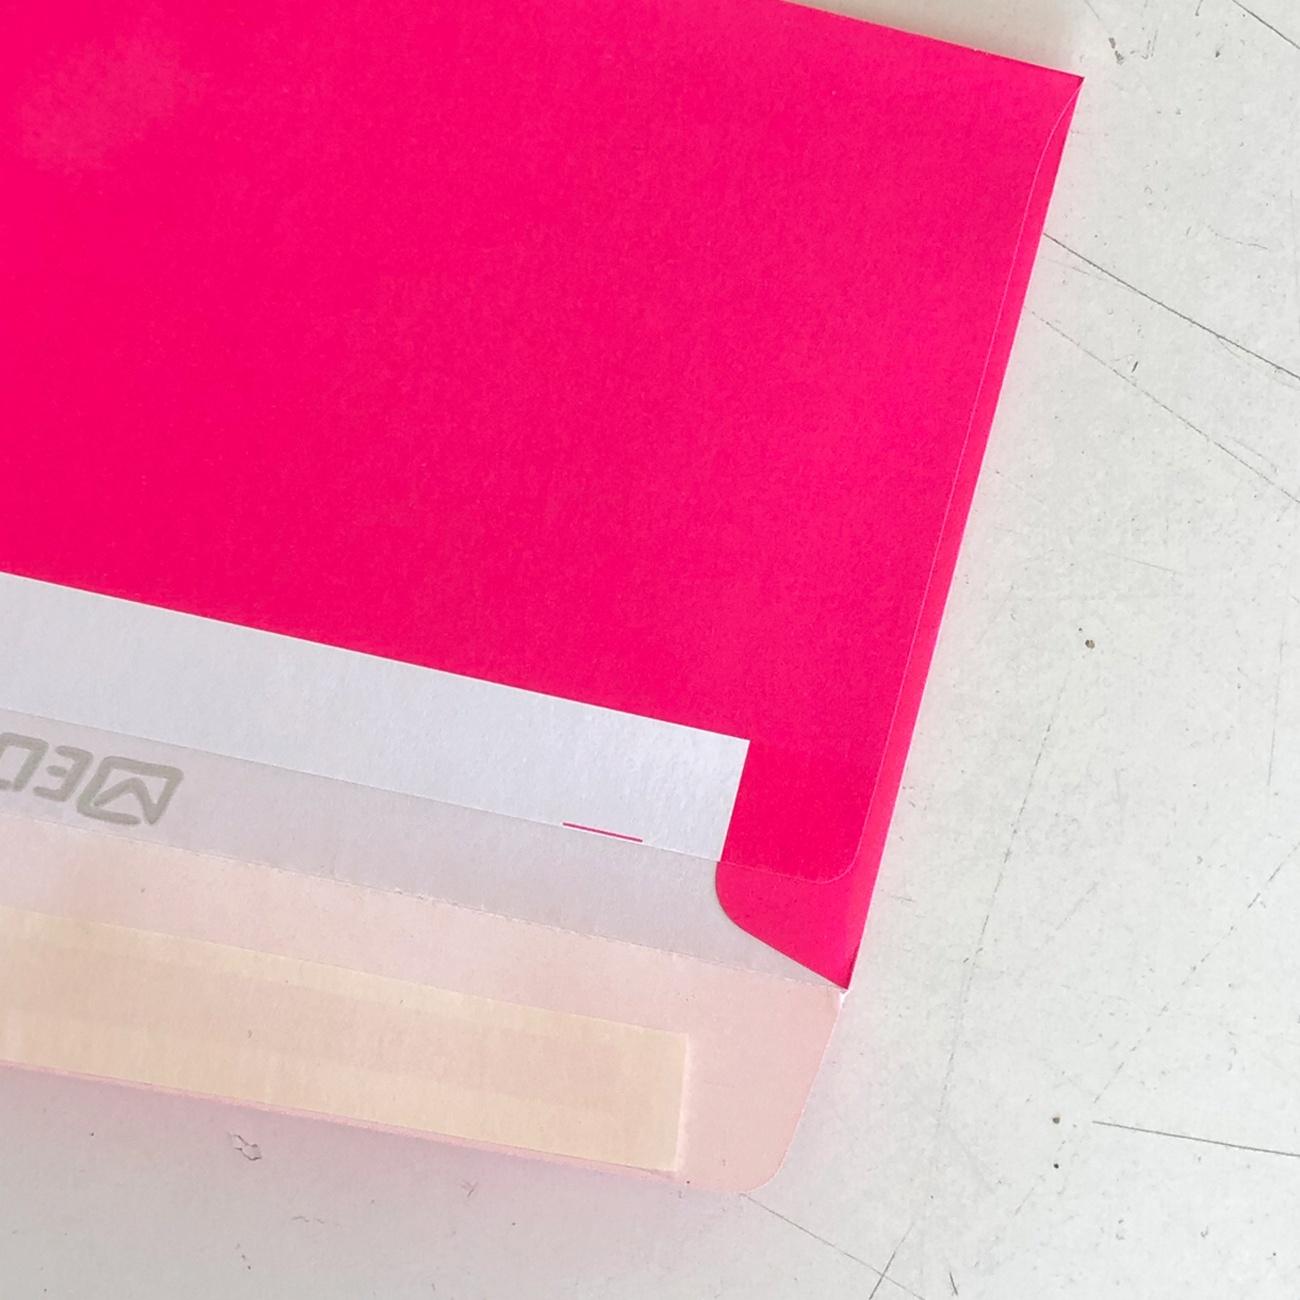 Neonkuvert, neonpink, Verschluss, Detail,